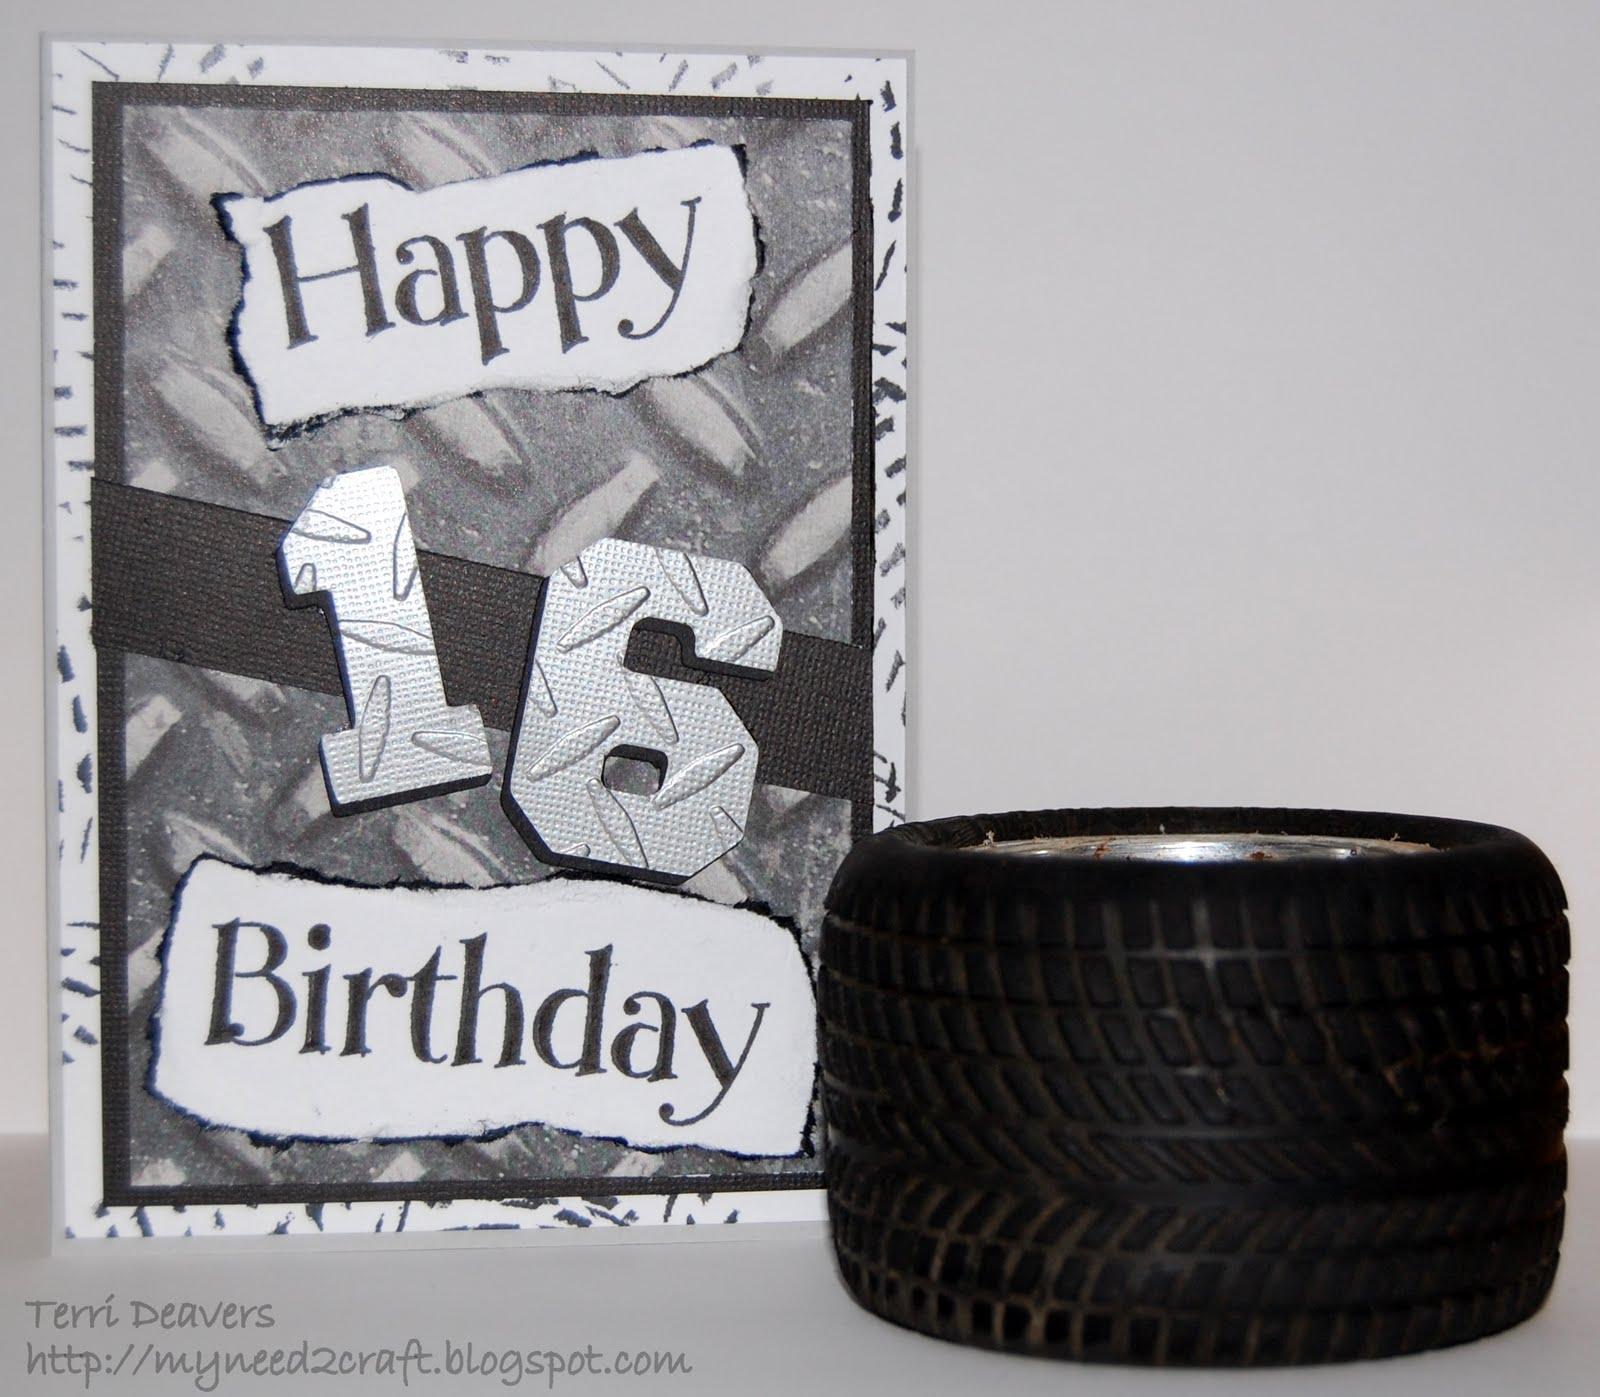 MyNeed2Craft By Terri Deavers: My Nephew's 16th Birthday